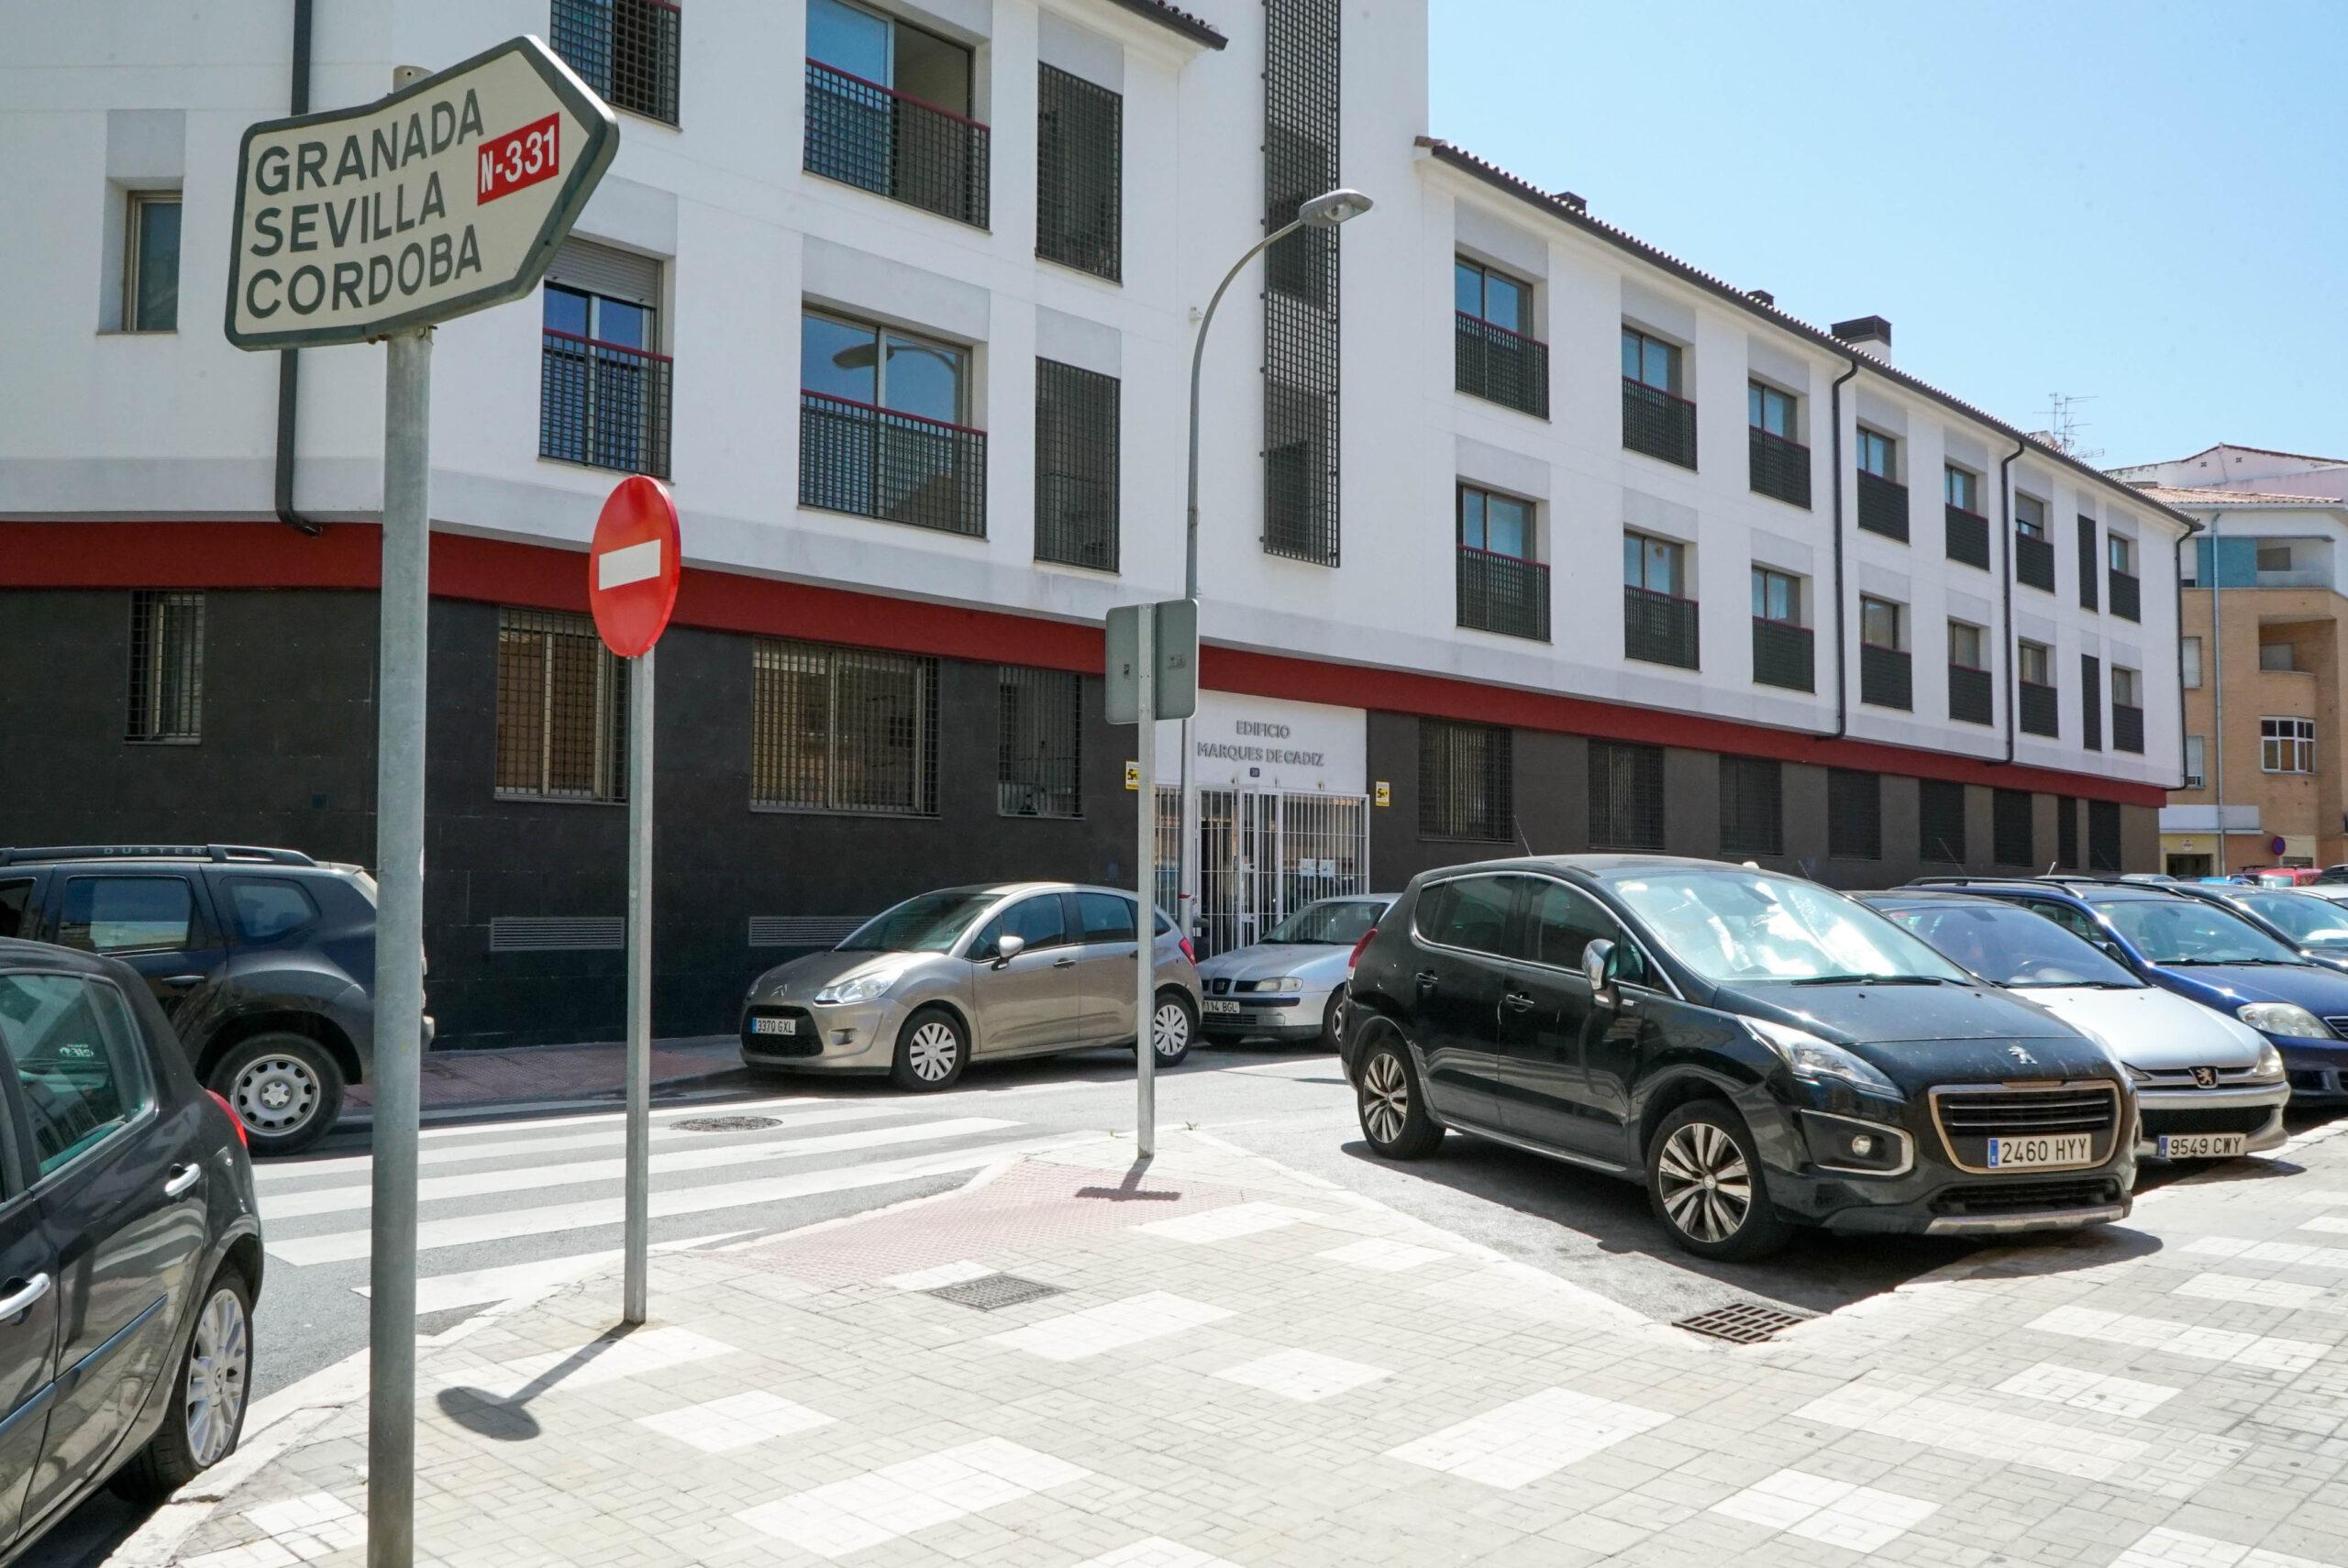 Appartement te koop in Malaga (Spanje, Costa del Sol)